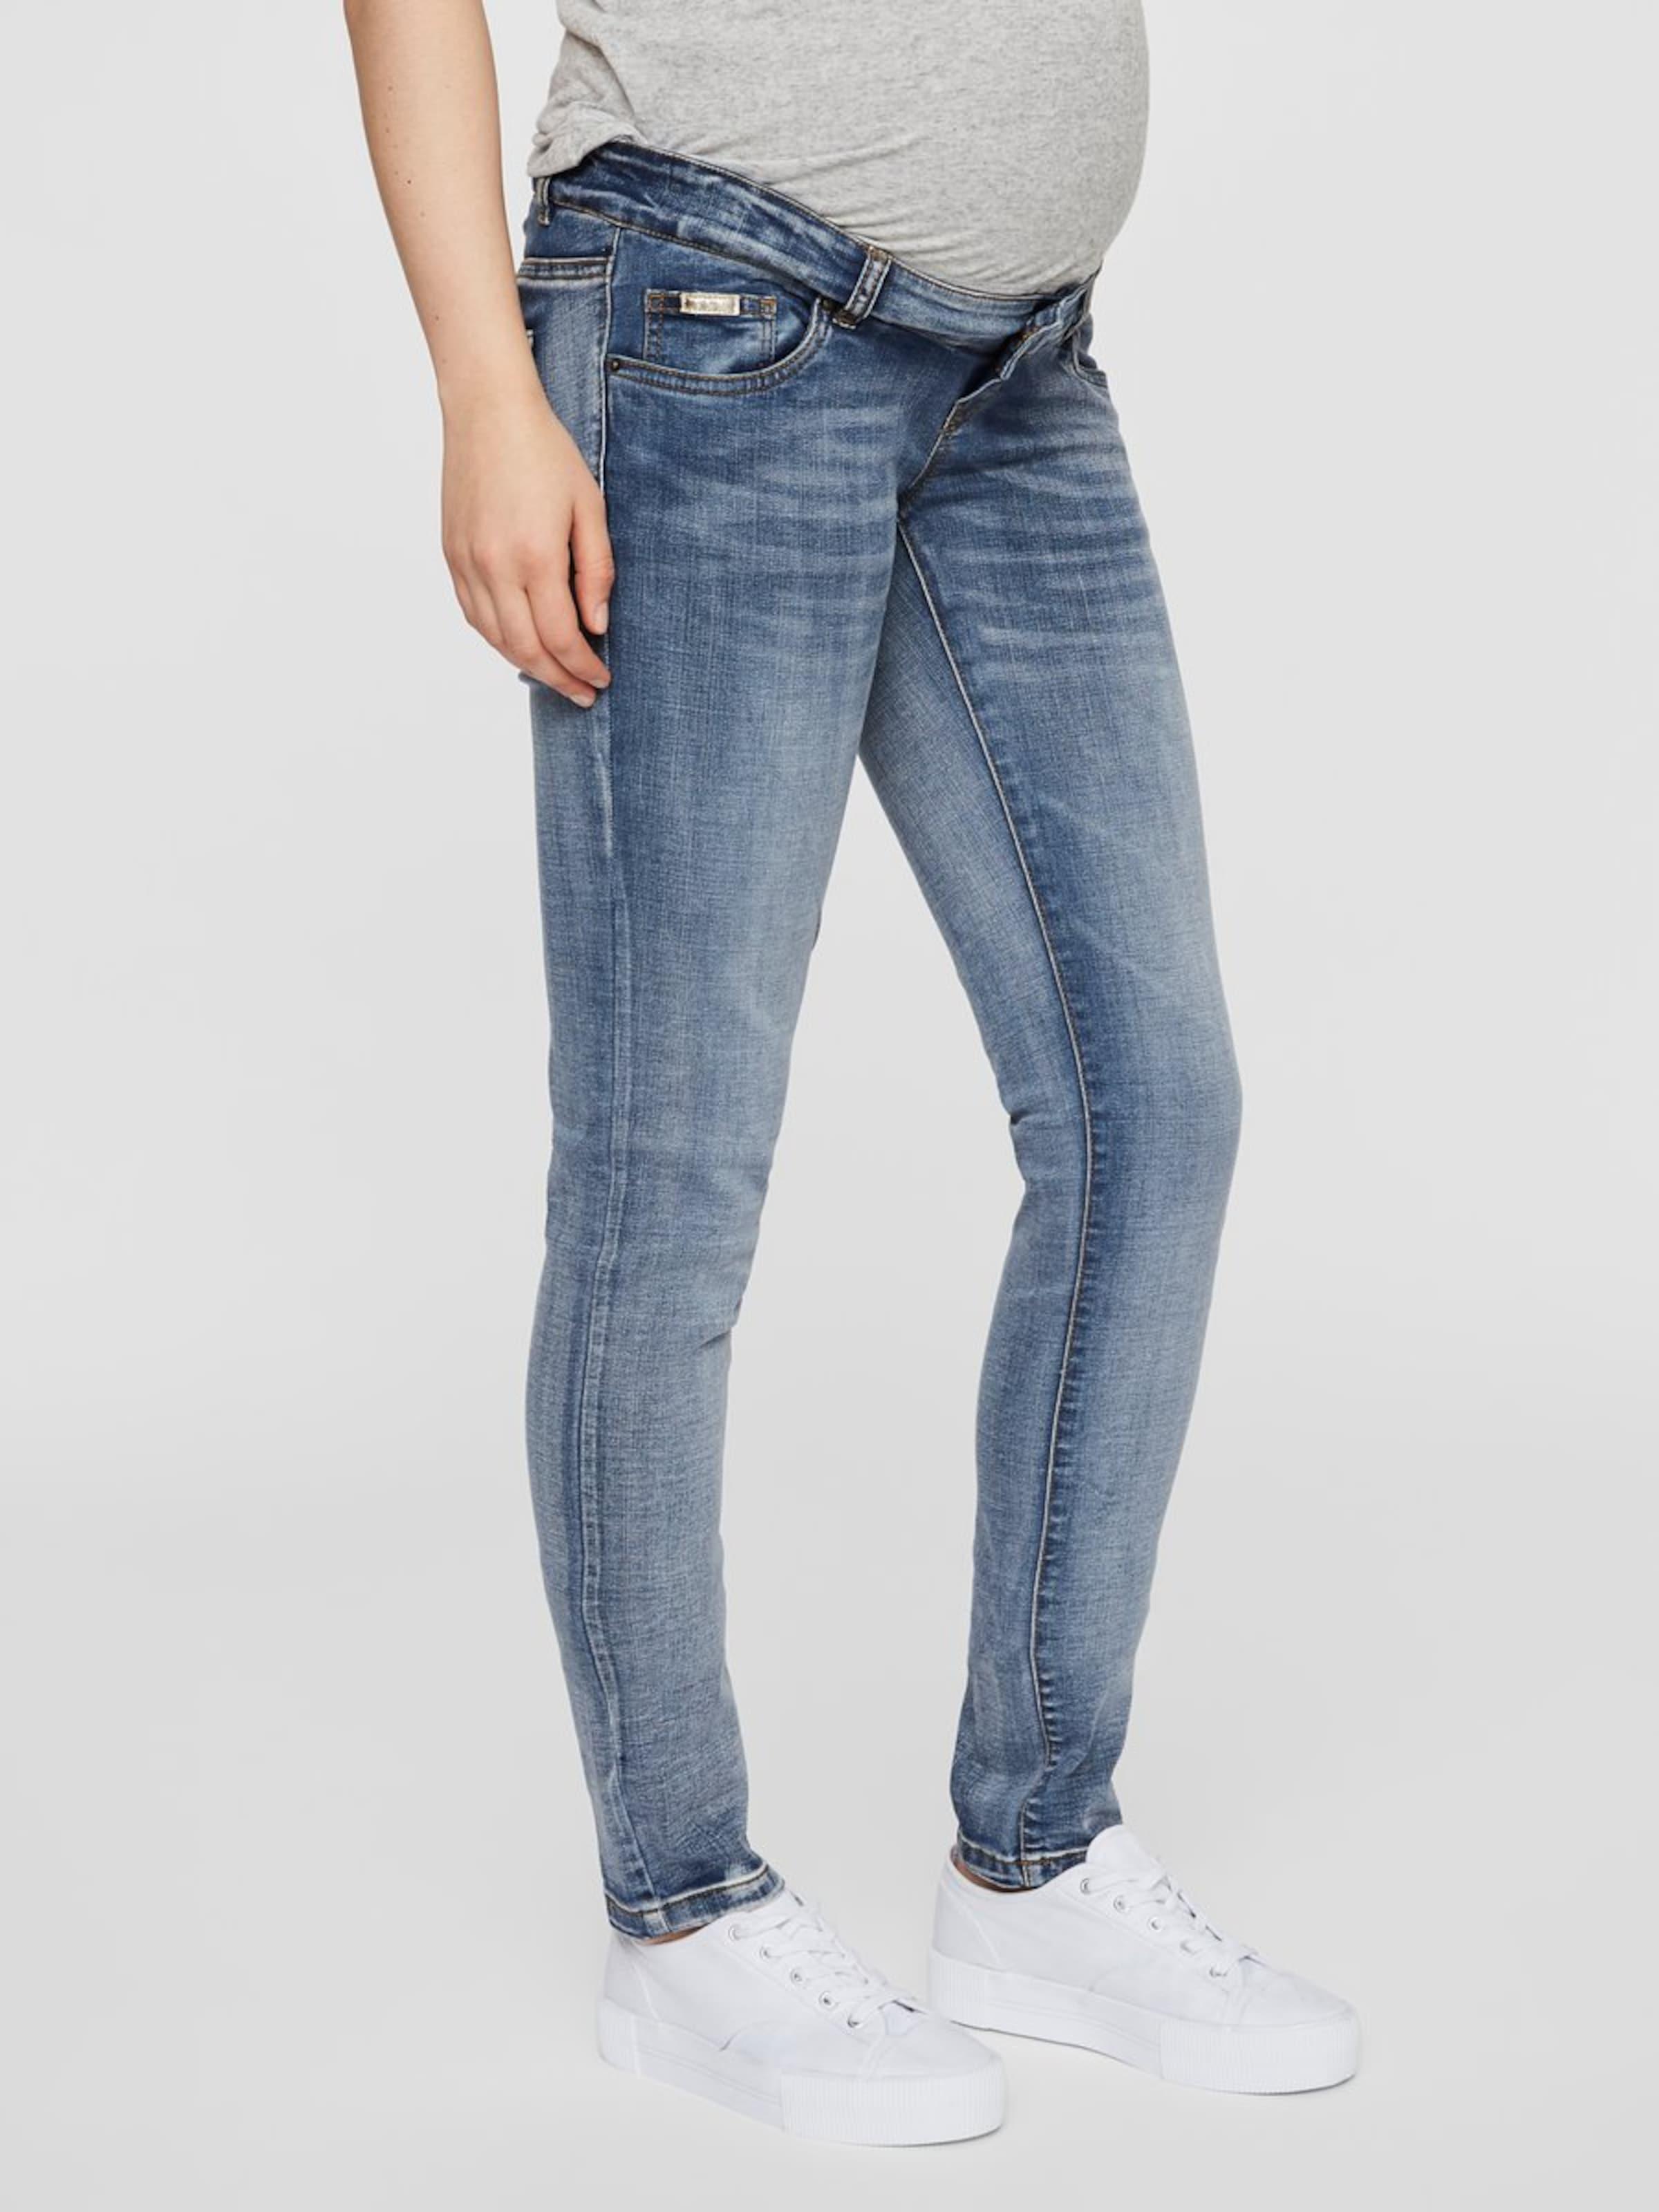 Mamalicious Jeans Mamalicious Blue Blue Jeans Denim In Jeans Denim Mamalicious In Blue In Yg6If7vby